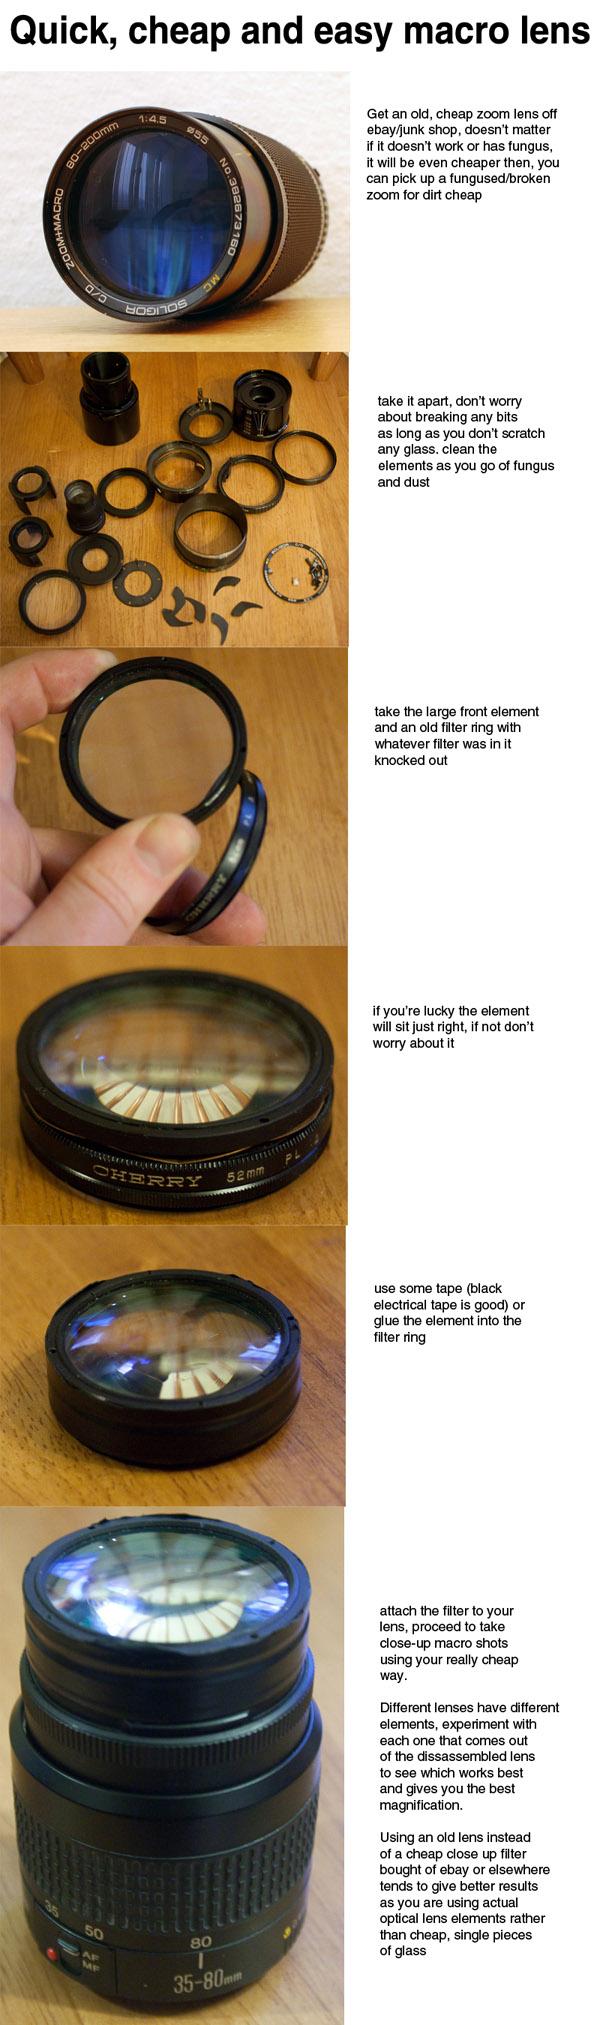 diy macro photography lens by nullboy on deviantART